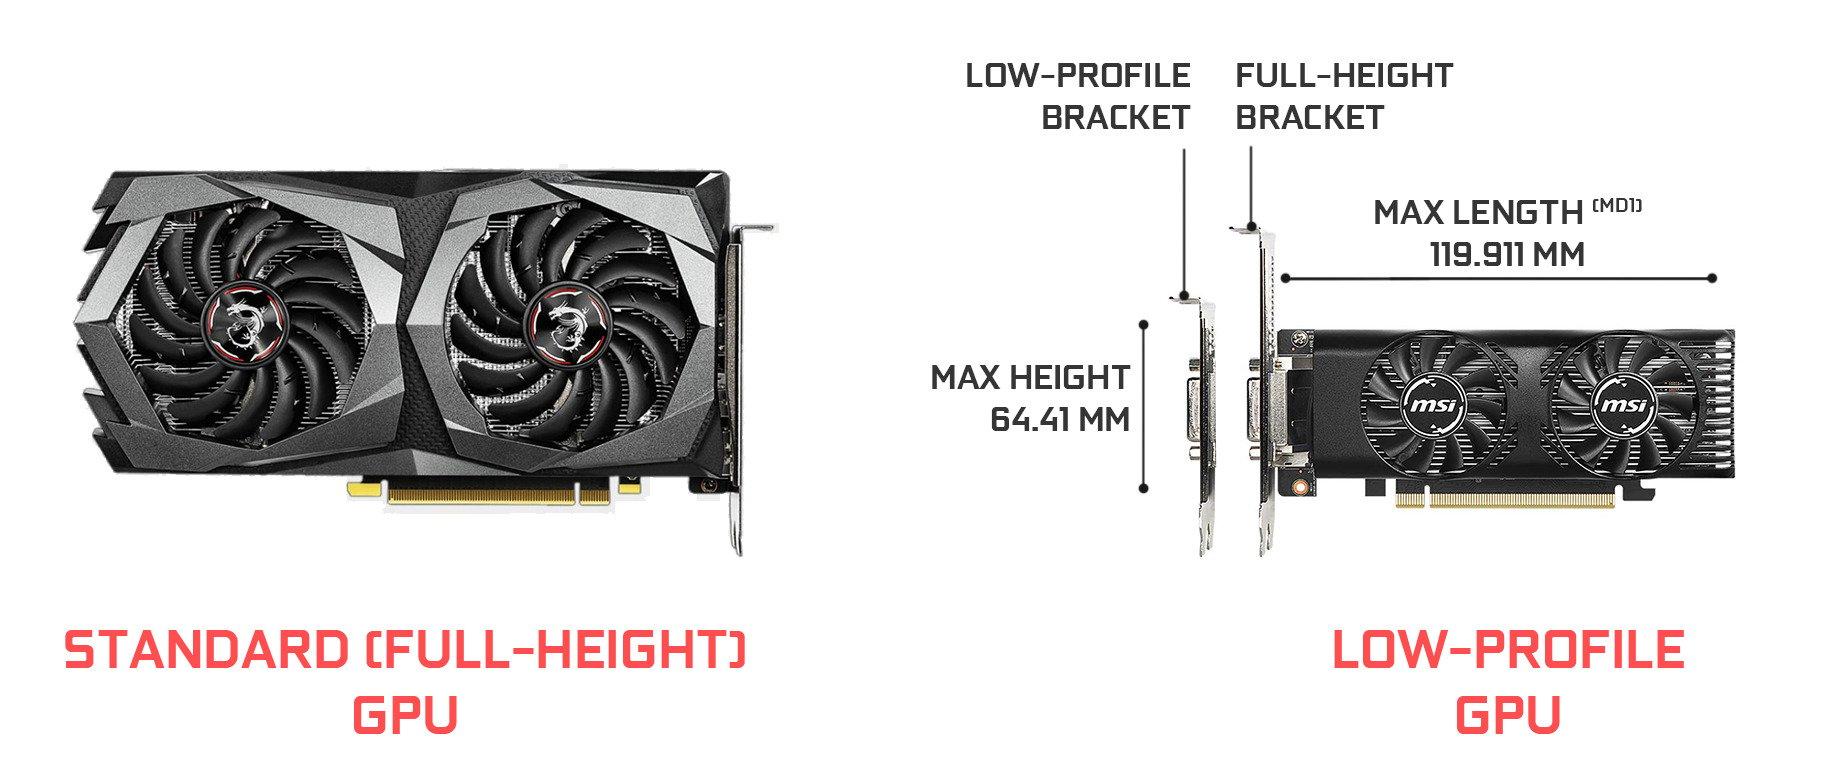 low-profile gpu overview comparison to standard sized gpu